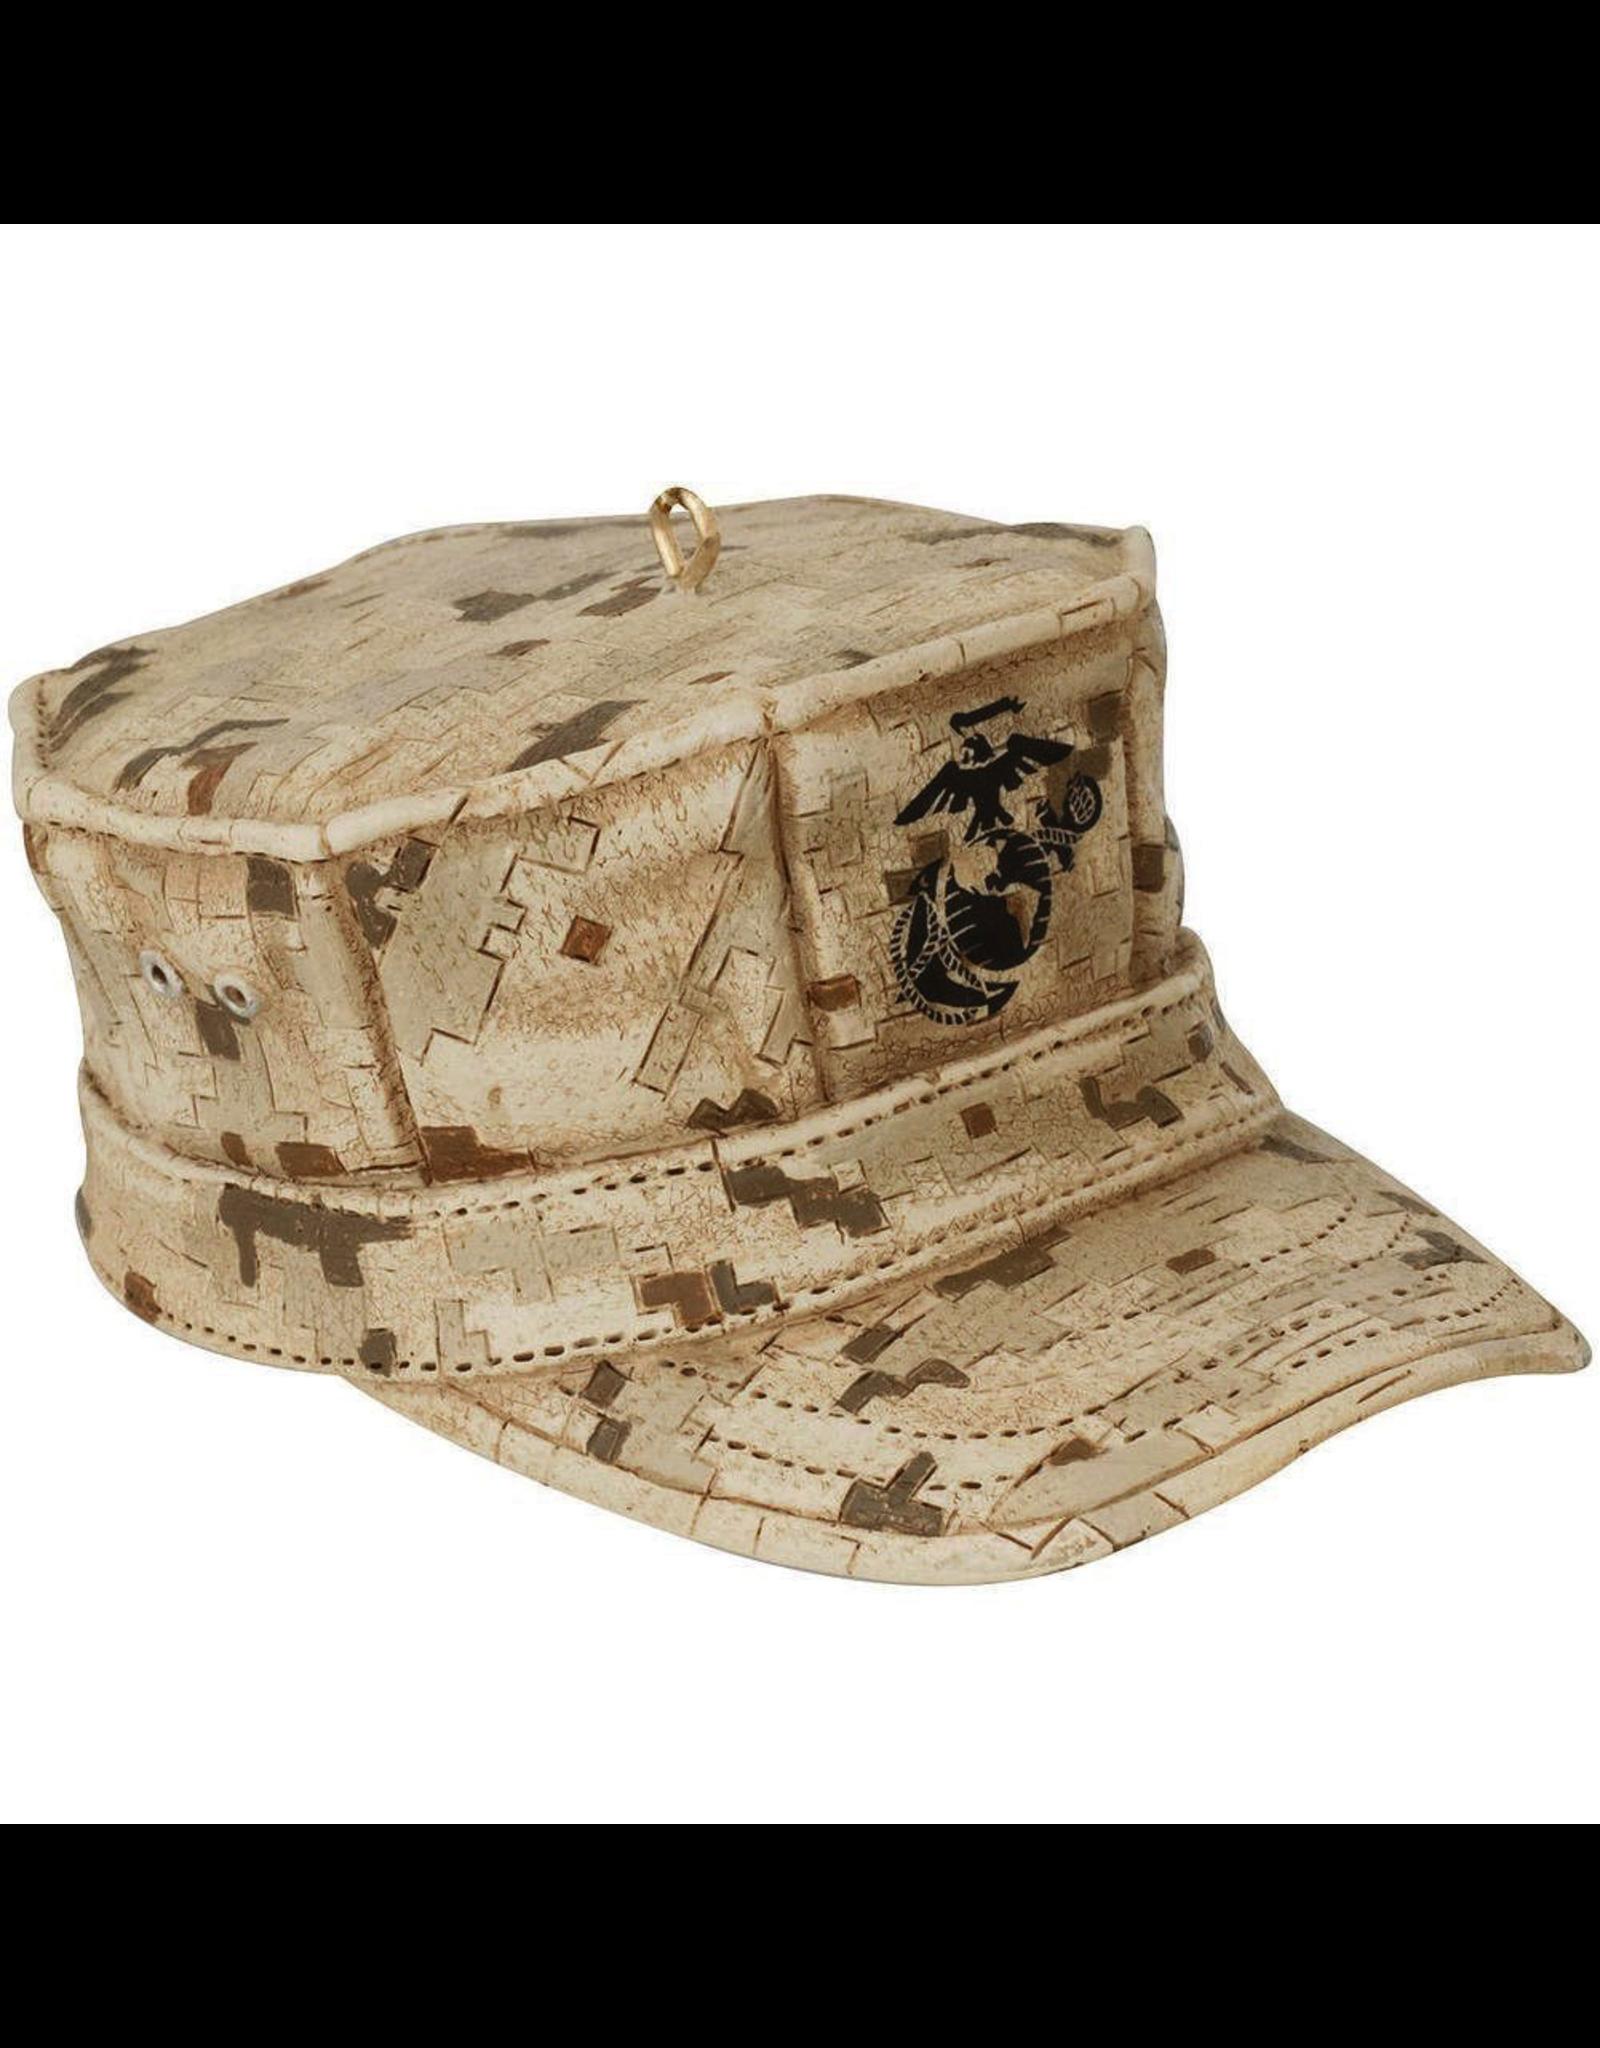 Kurt Adler United States Marine Corps Cap Christmas Ornament